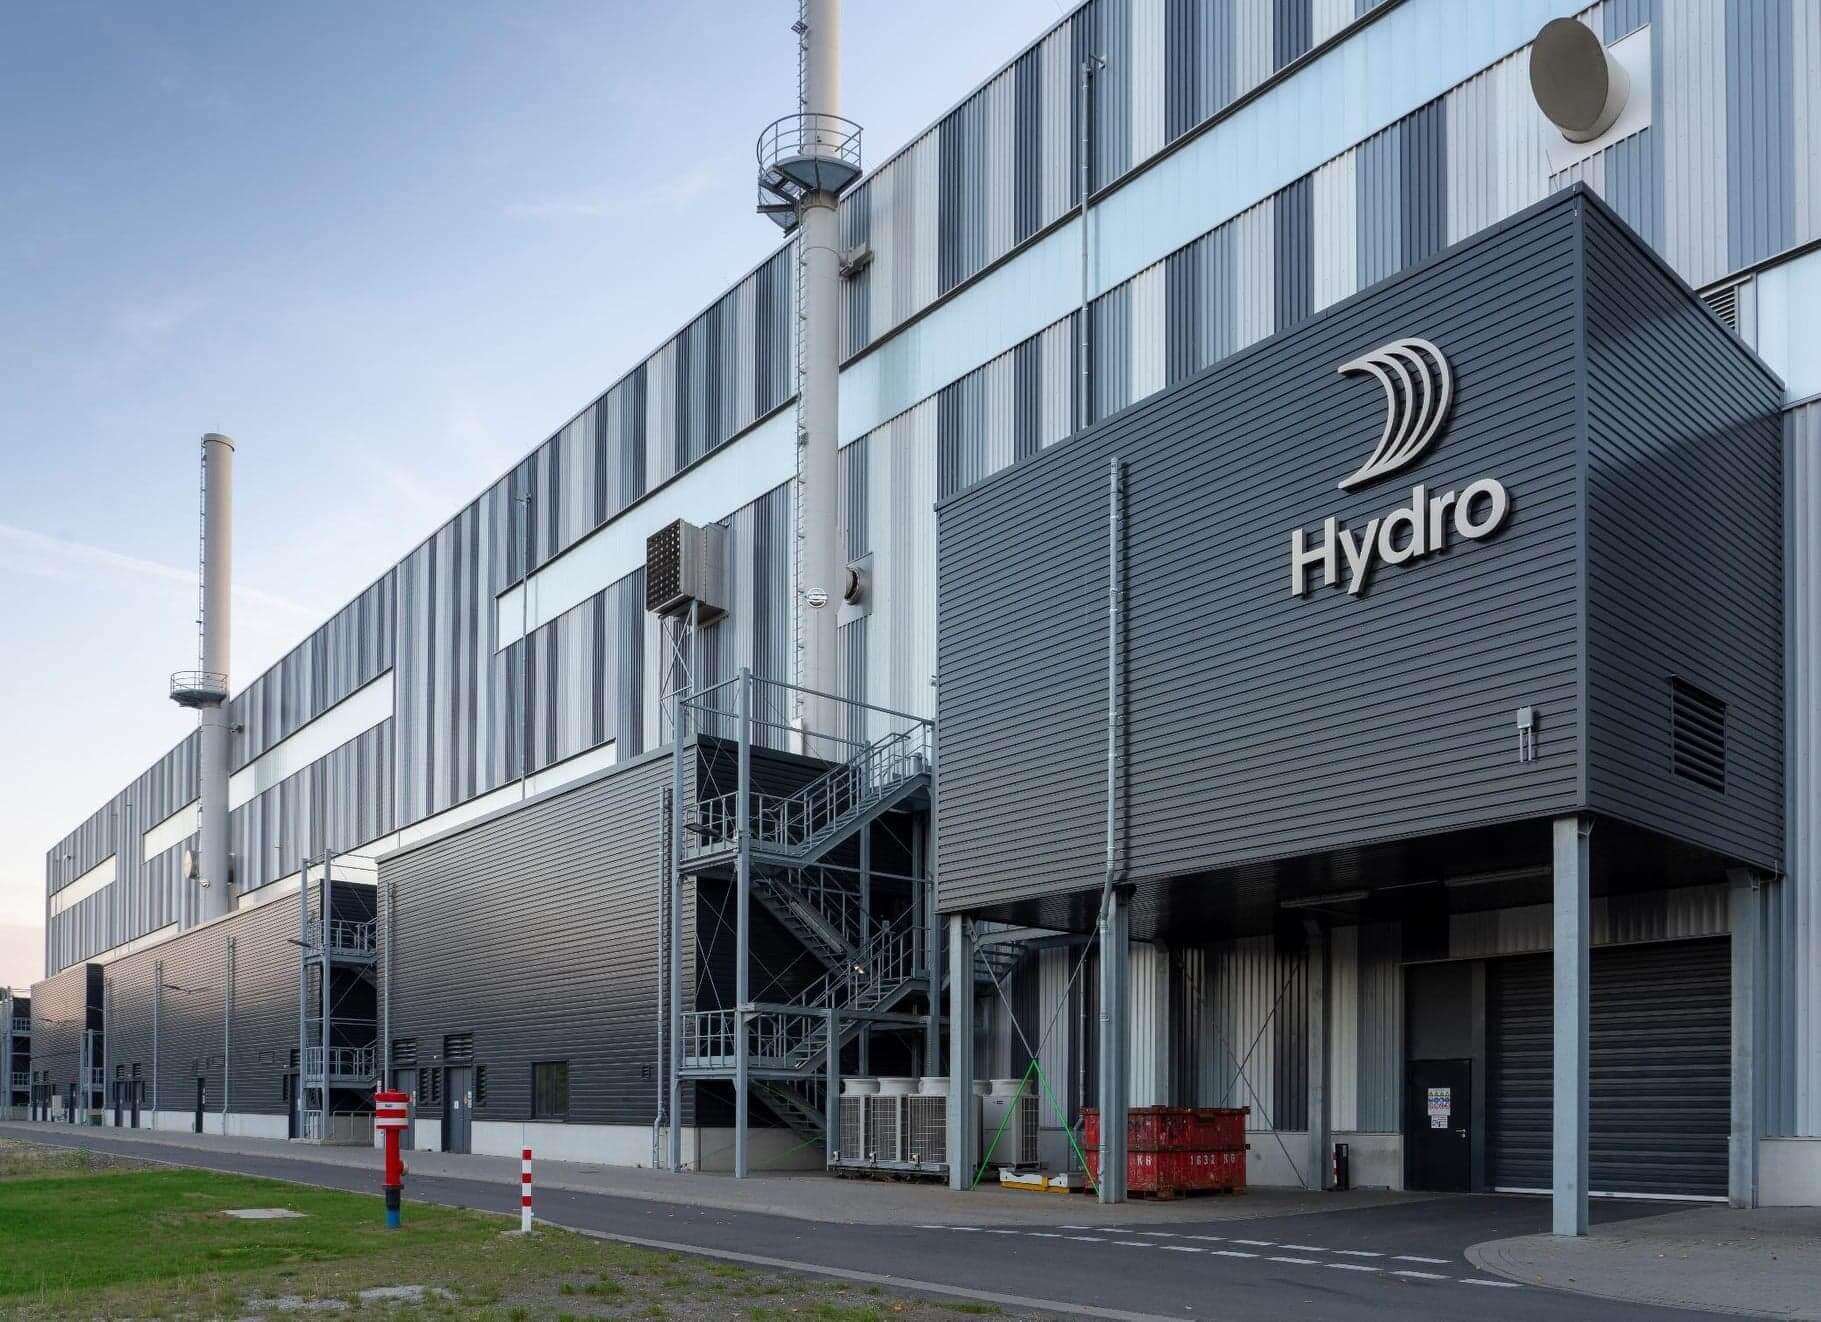 Hydro Grevenbroich Germany